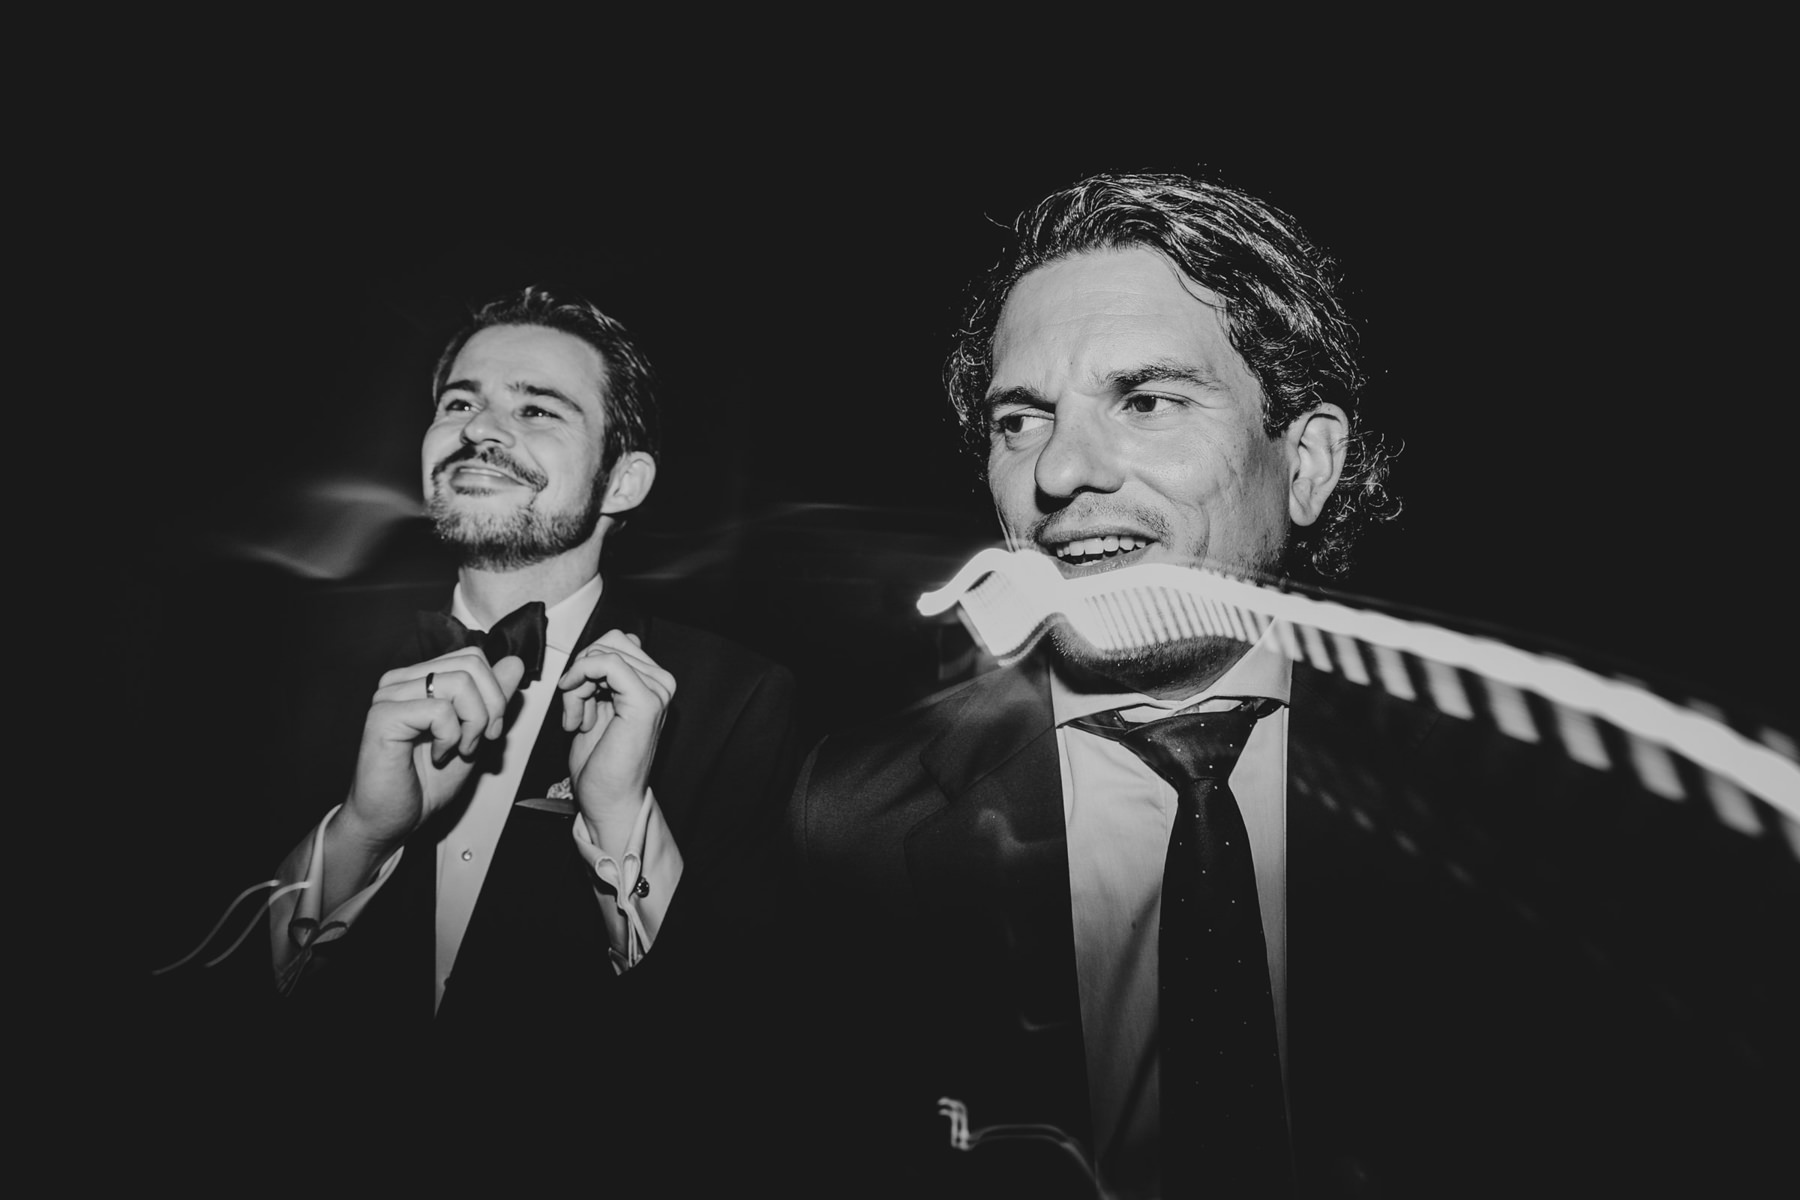 Wedding_Photography_Carlos_Hevia_Barcelona_Berlin_56.jpg